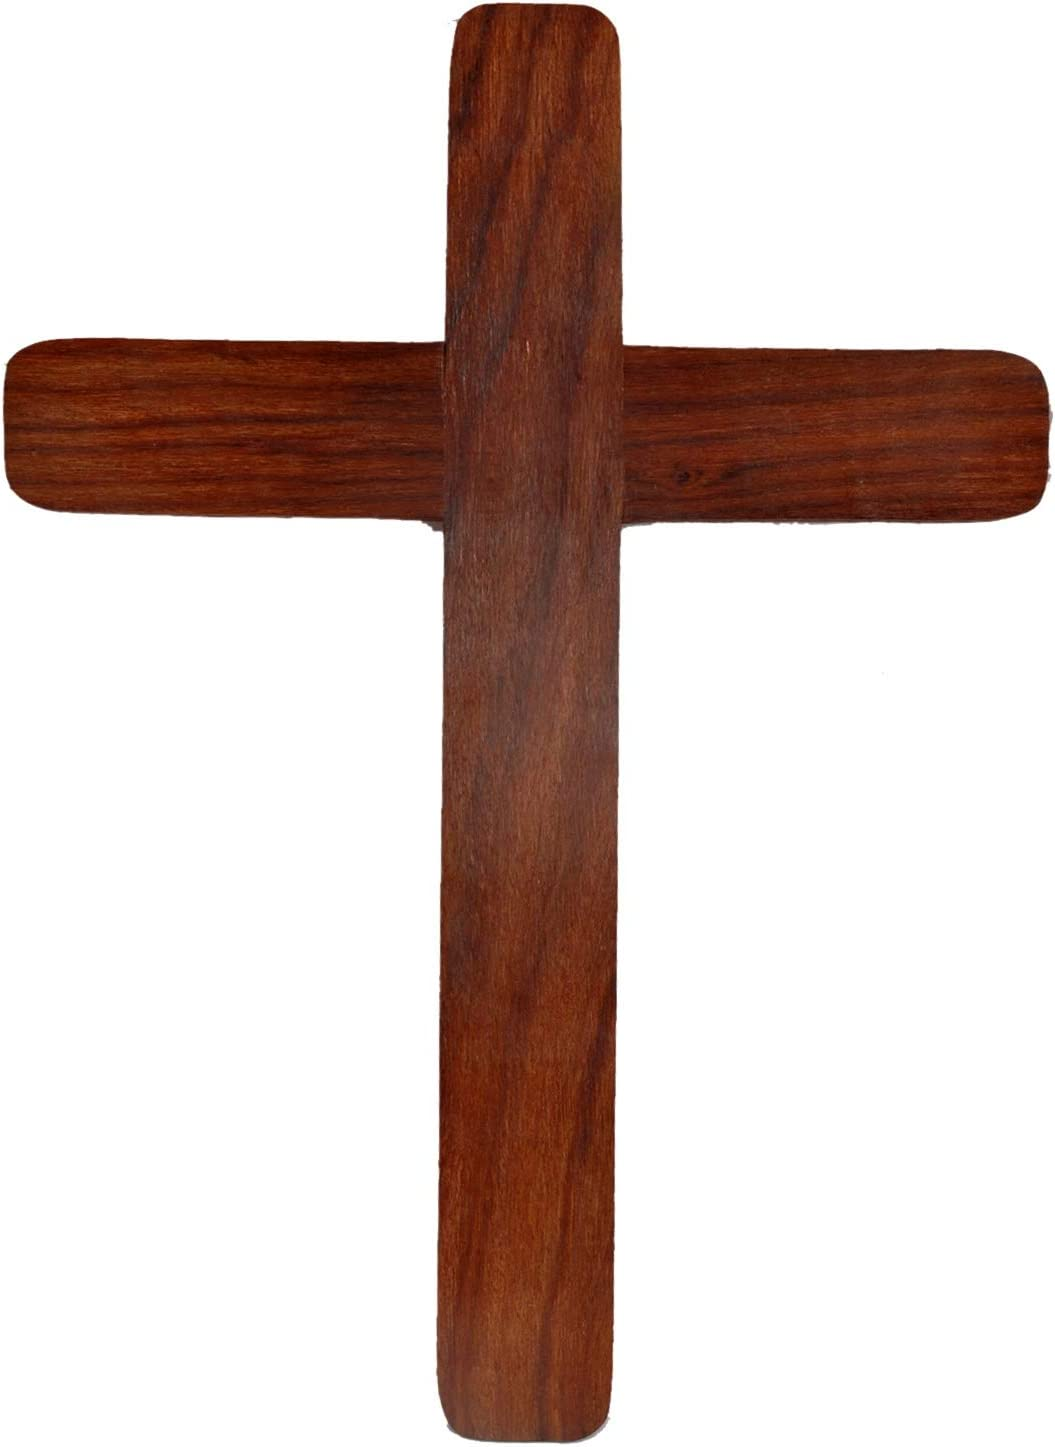 Hashcart Wooden Jesus Christ for Wall Hanging Cross, Chapel Decoration (15 Inch) | Jesus Christ Cross